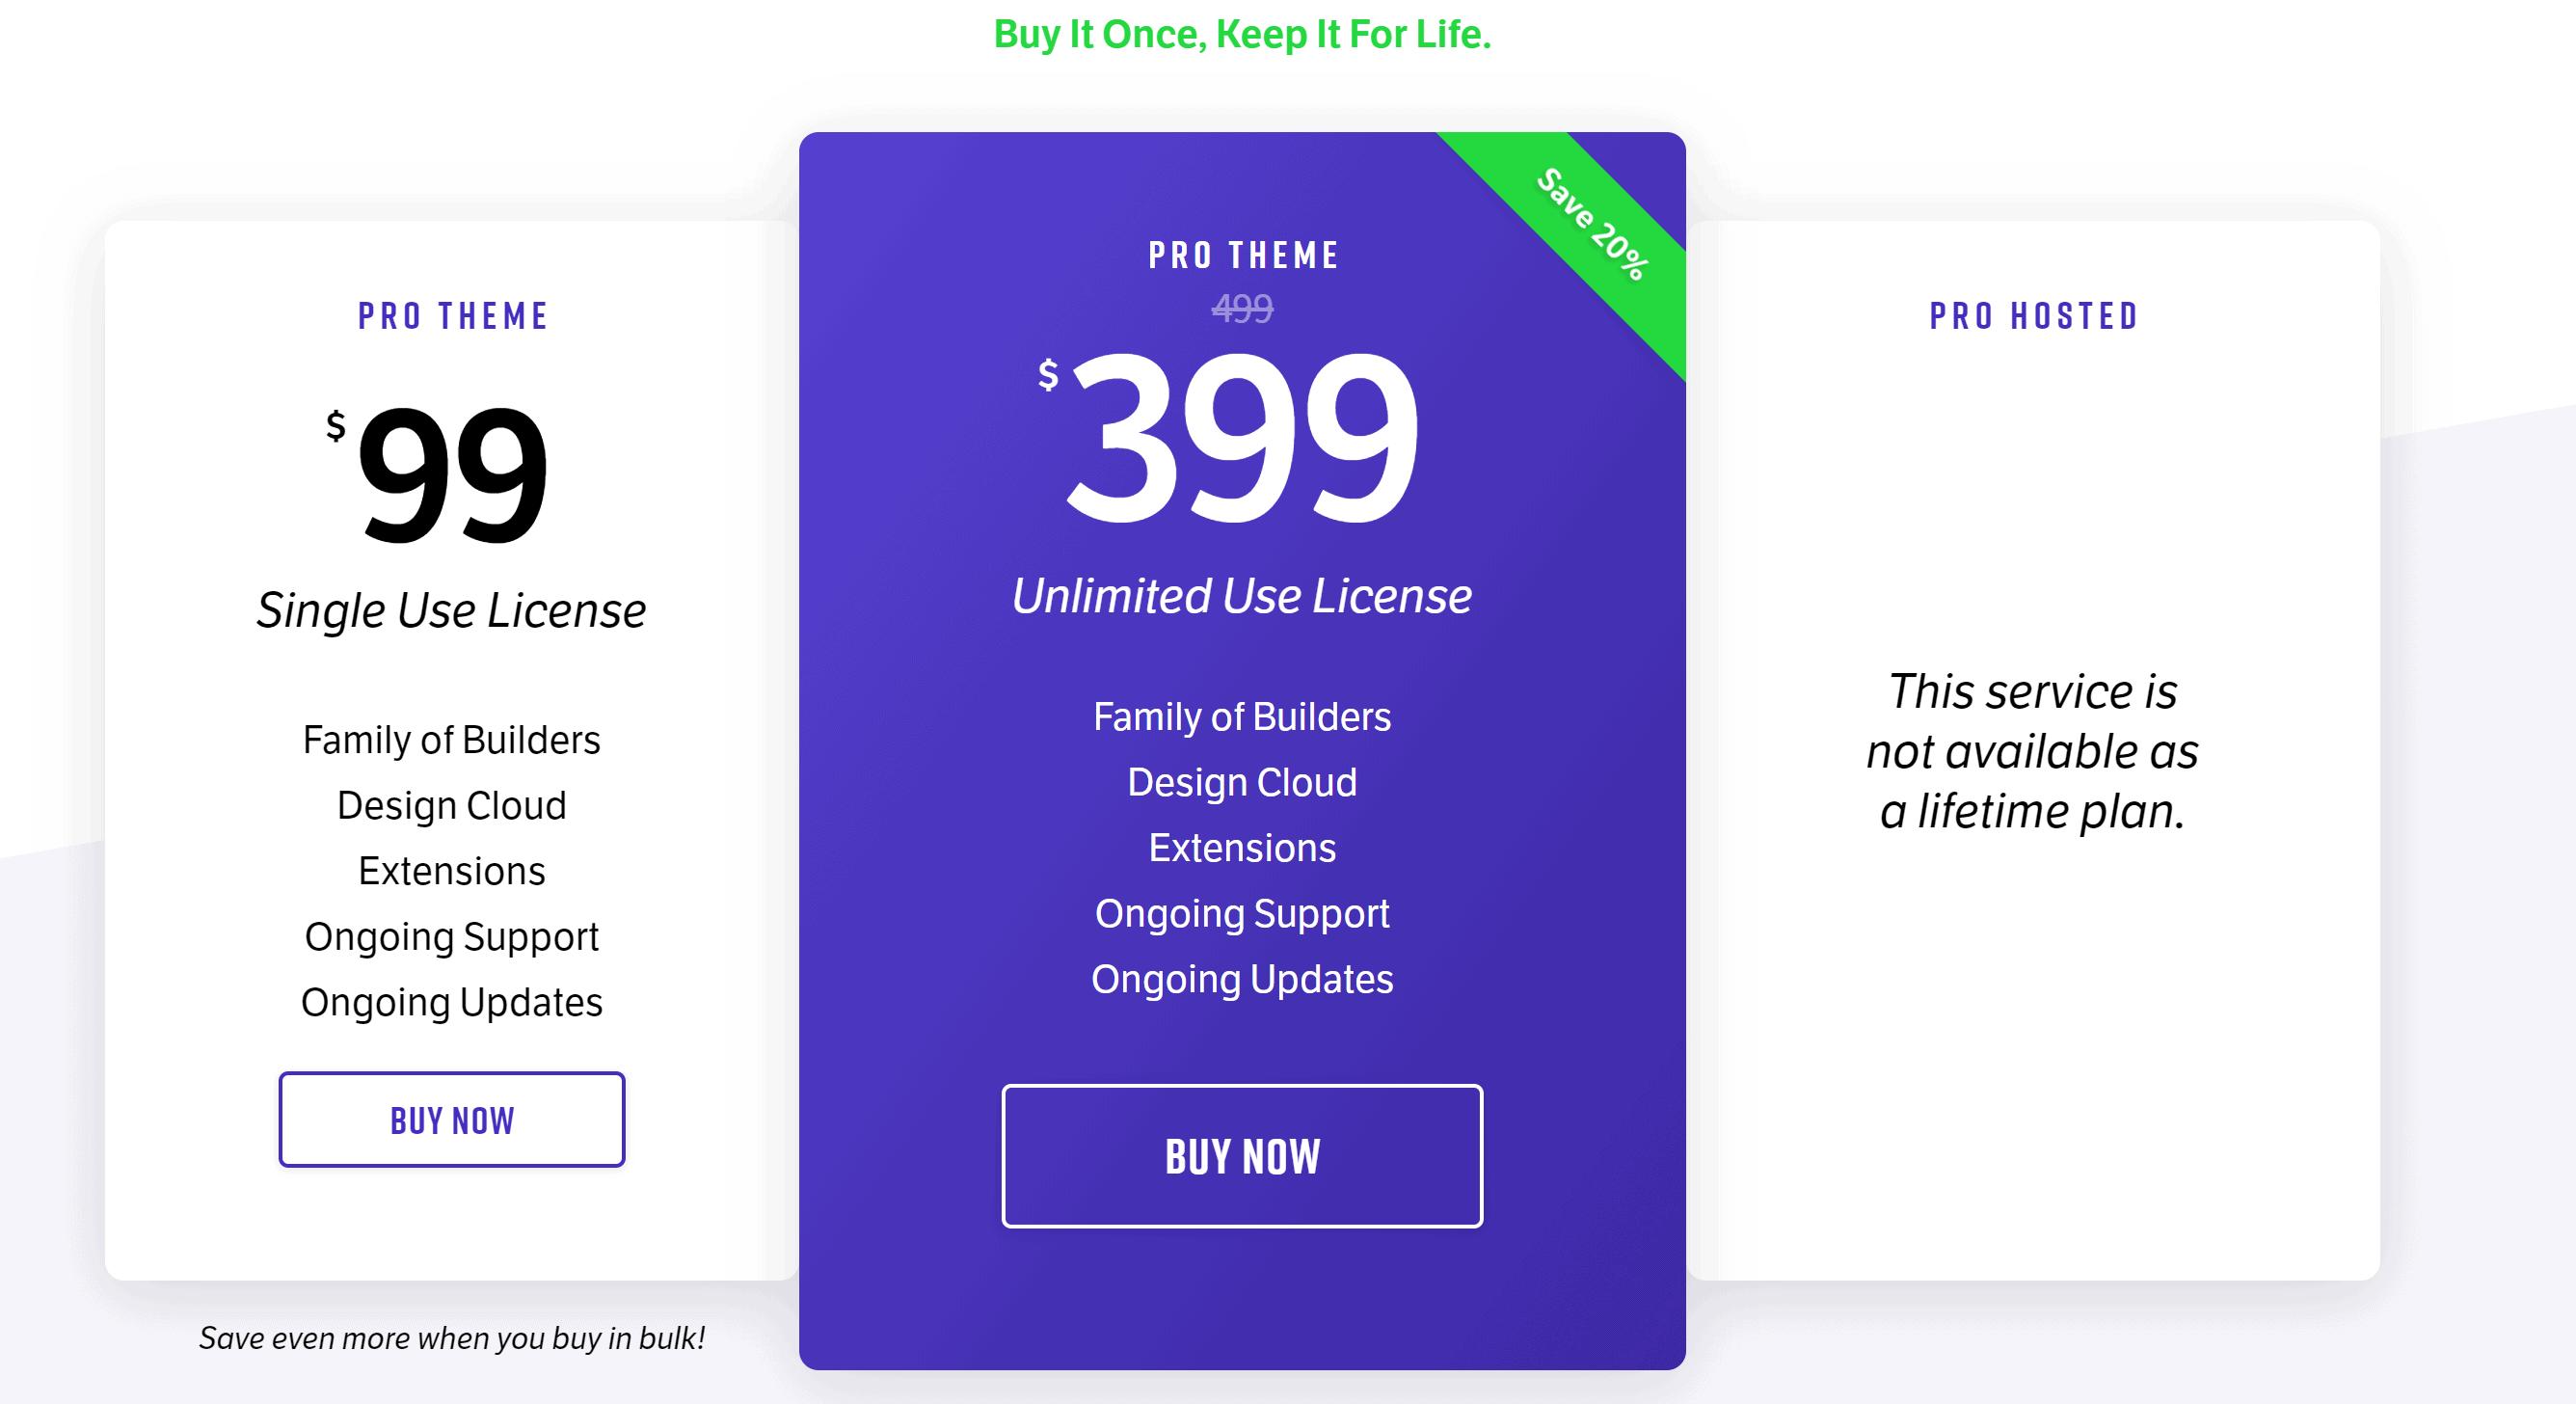 X Pro theme license Pricing